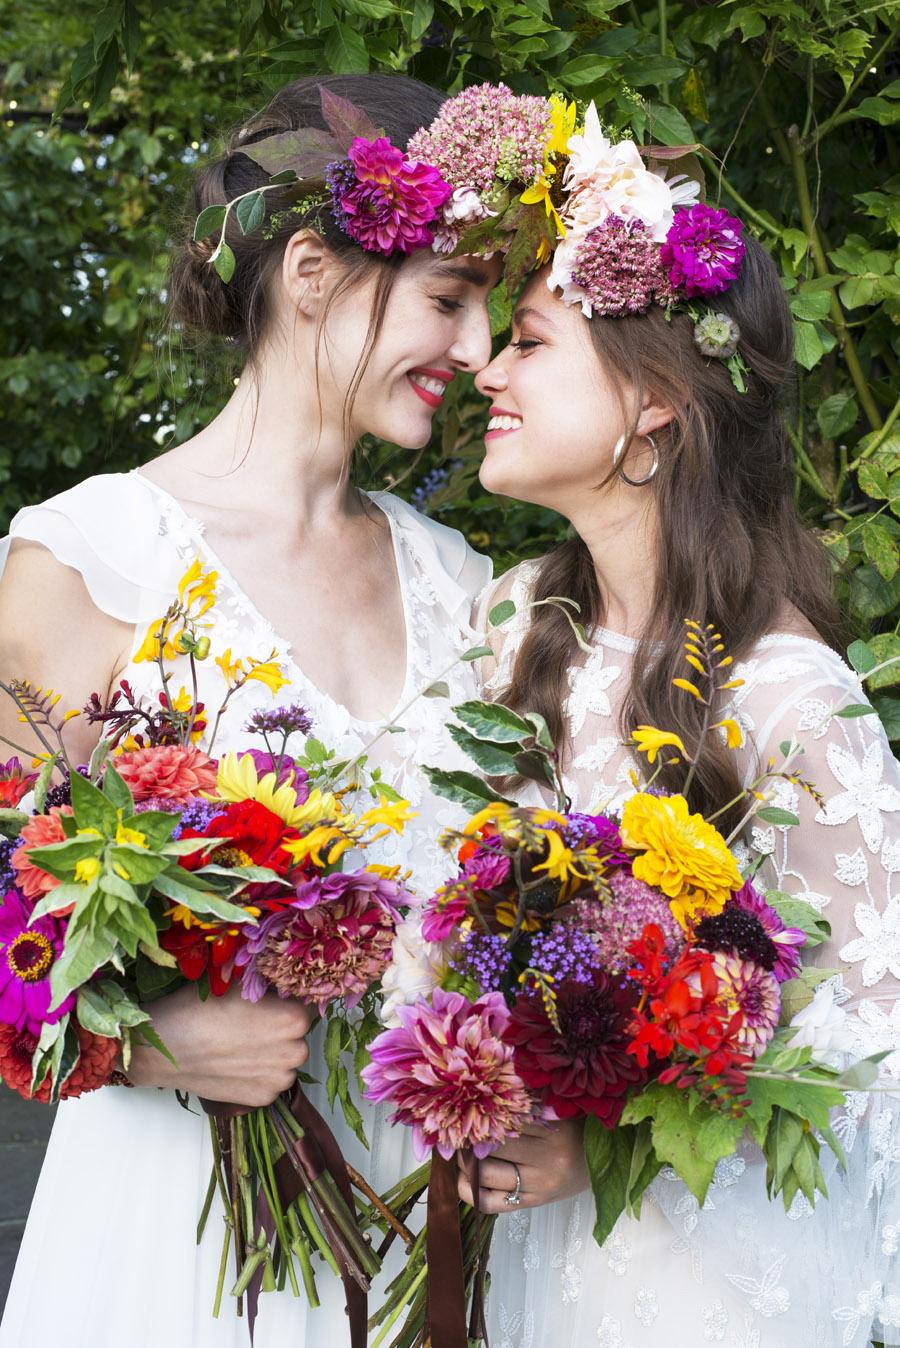 Same sex wedding styling boho chic festival inspiration - image credit Emma Hall Photography (30)